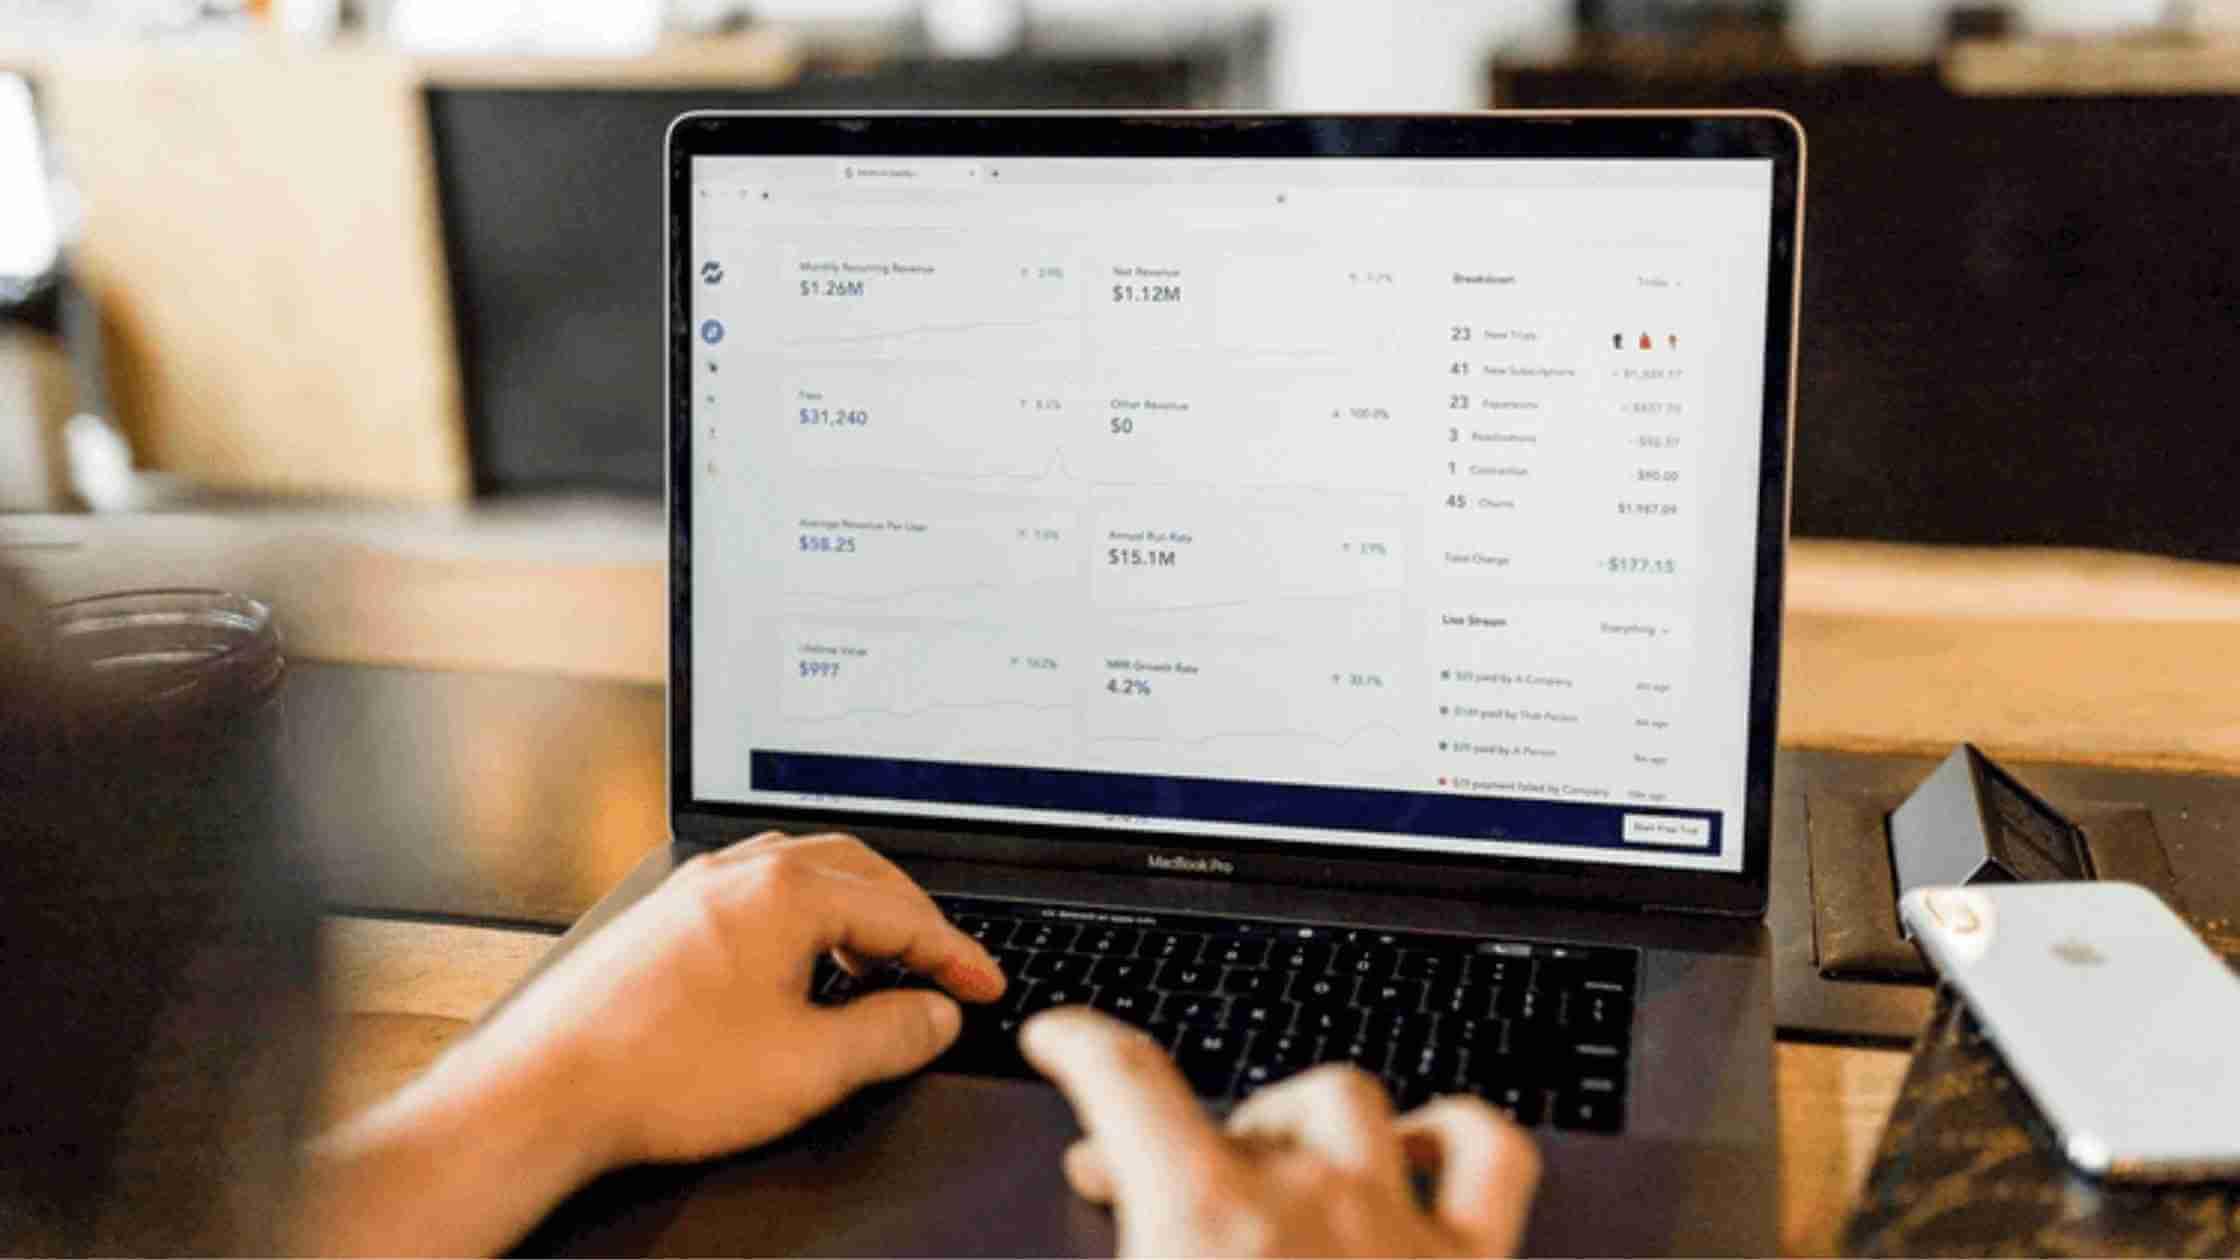 5 things to consider before choosing a b2B e-commerce platform